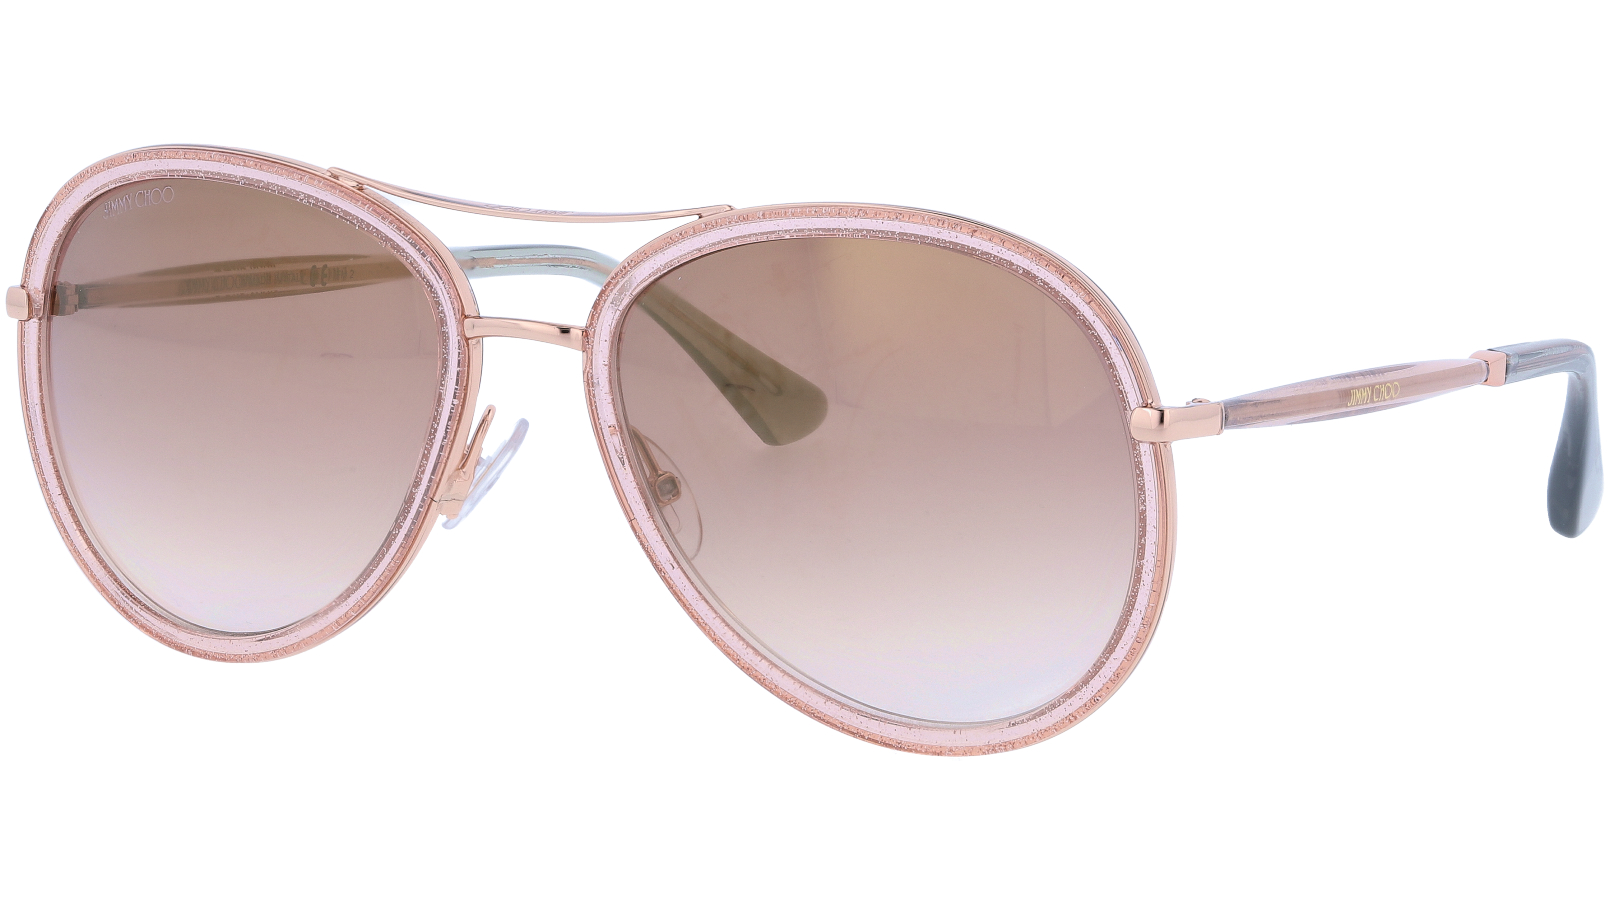 Jimmy Choo TORAS QBQNH 57 Pink Sunglasses